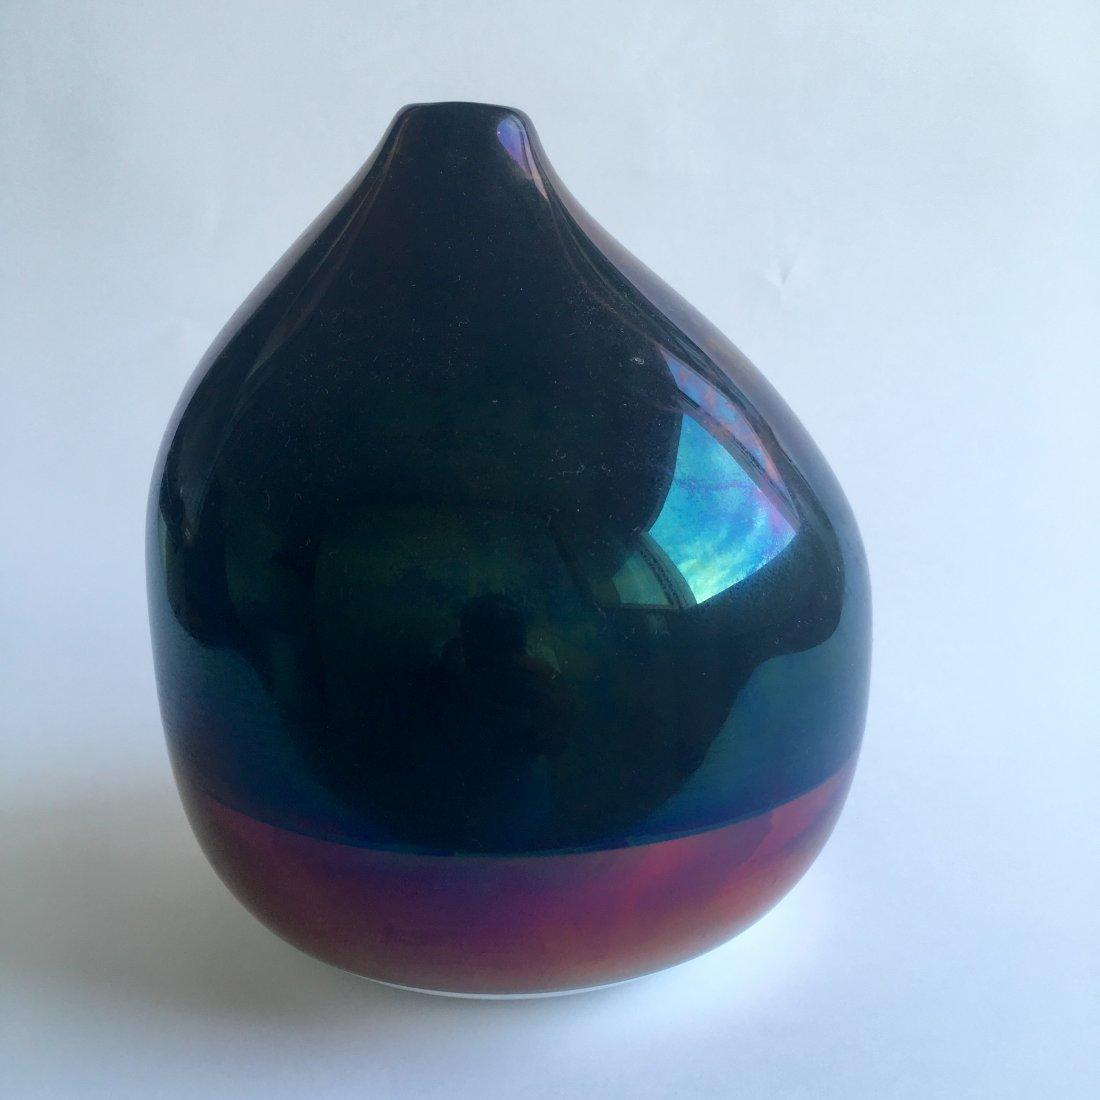 Thomas Stearns for Venini Murano Glass Vase, 1962 - 4